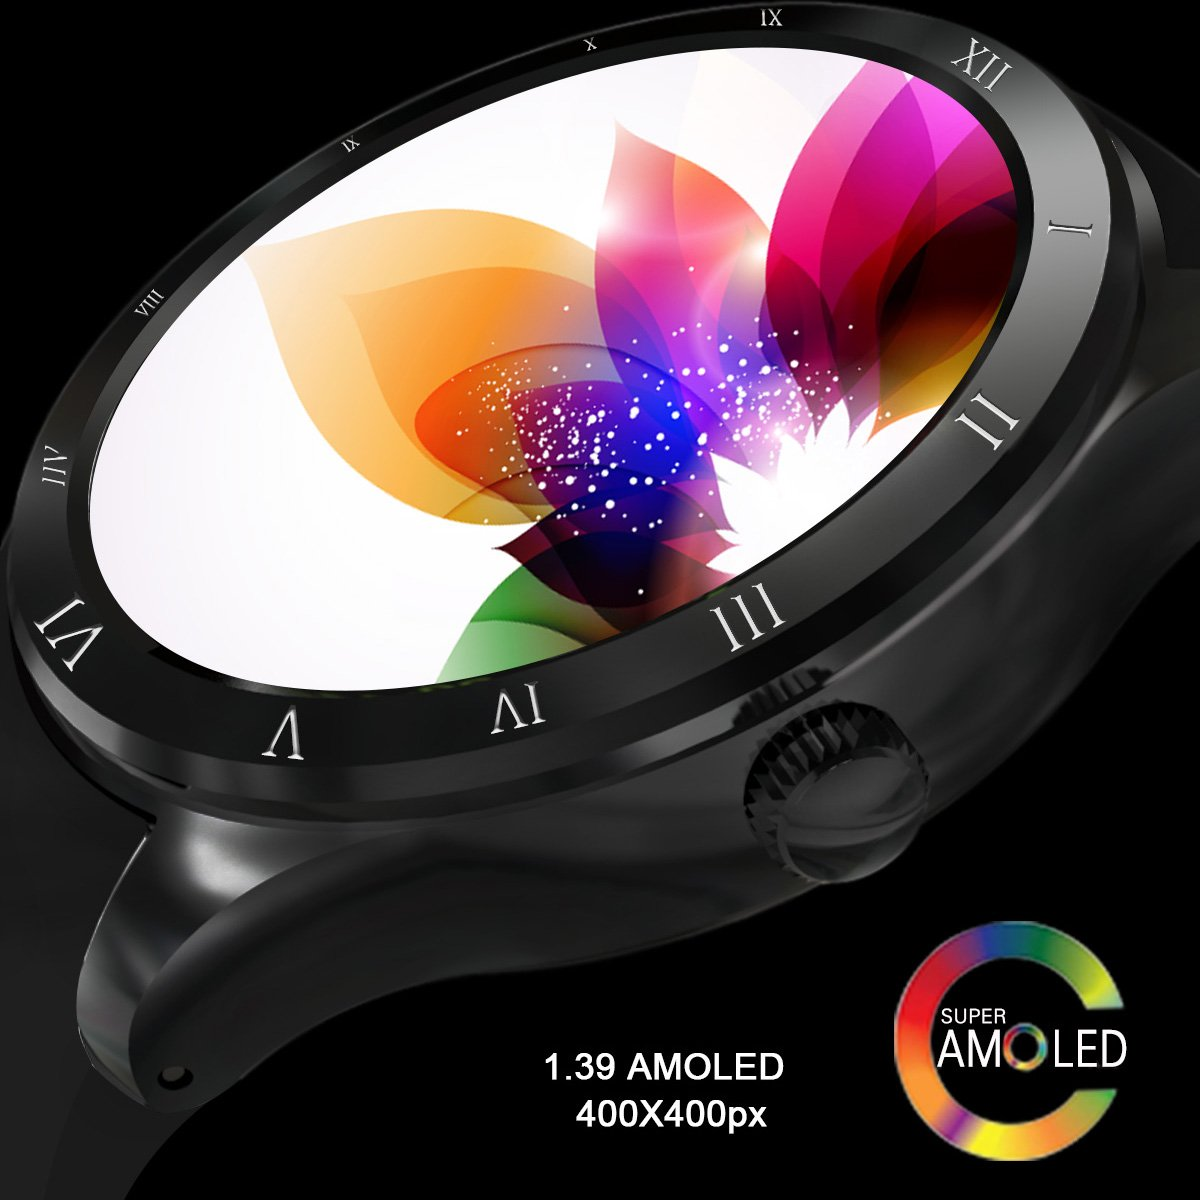 Amazon.com: Diggro DI05 Smart Watch Bluetooth MTK6580 Support WIFI GPS Microphone Speaker 3G Nano SIM Card 1.3GHZ Quad Core RAM/ROM 512MB+8GB 1.39inch ...